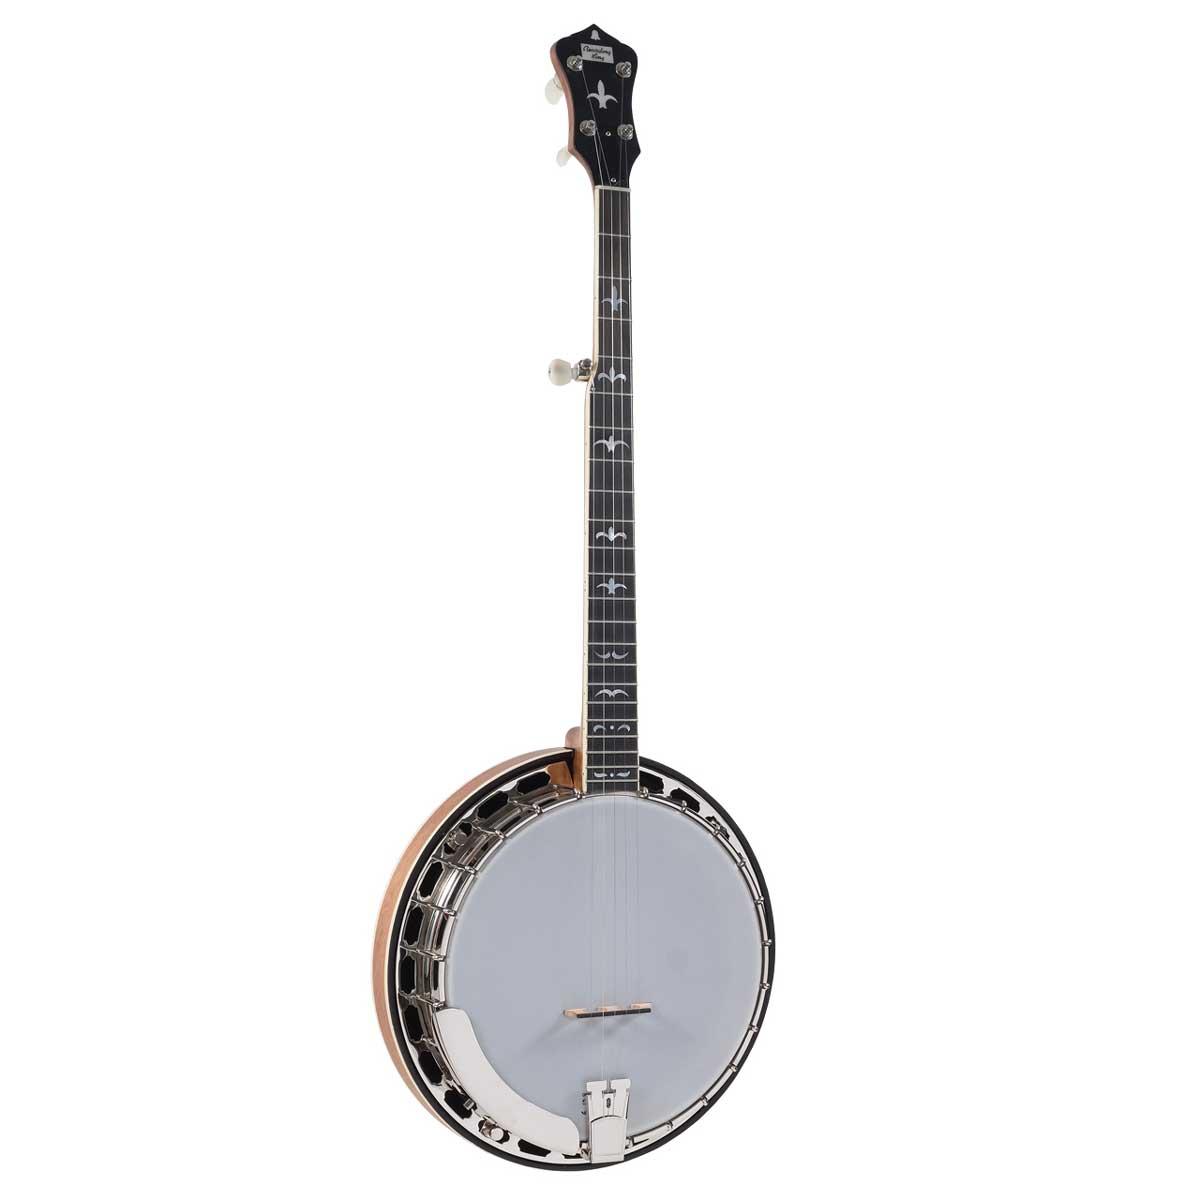 5-strenget banjo